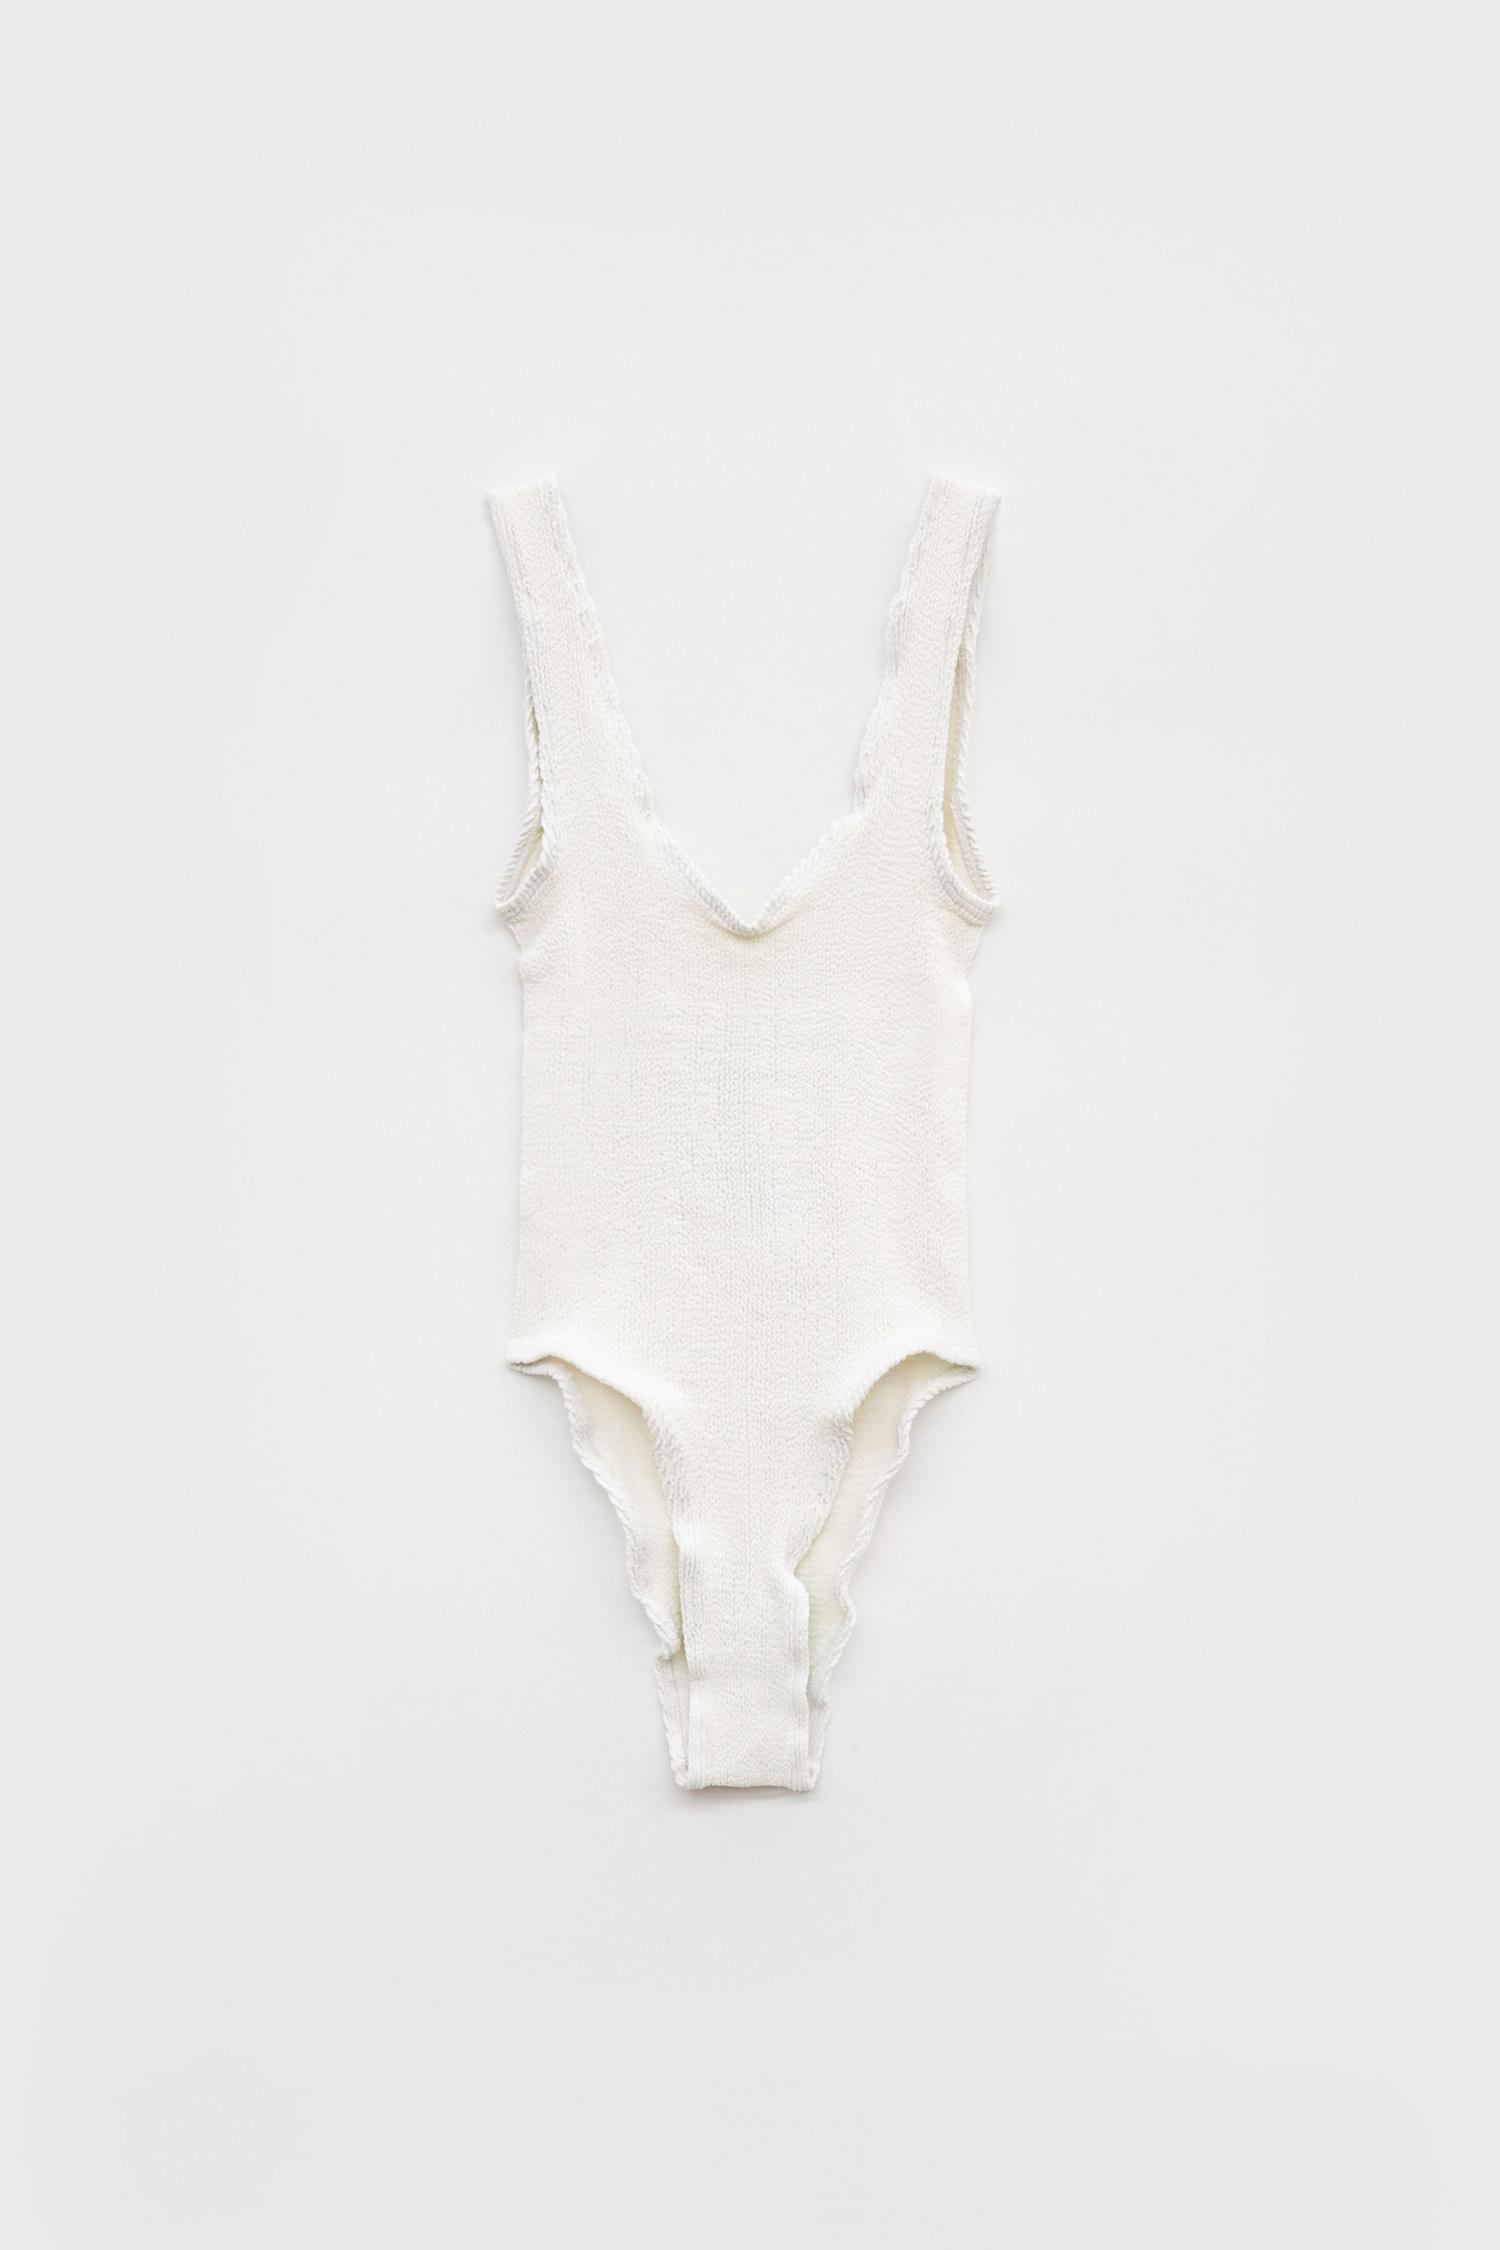 Ivy One piece Swimsuit